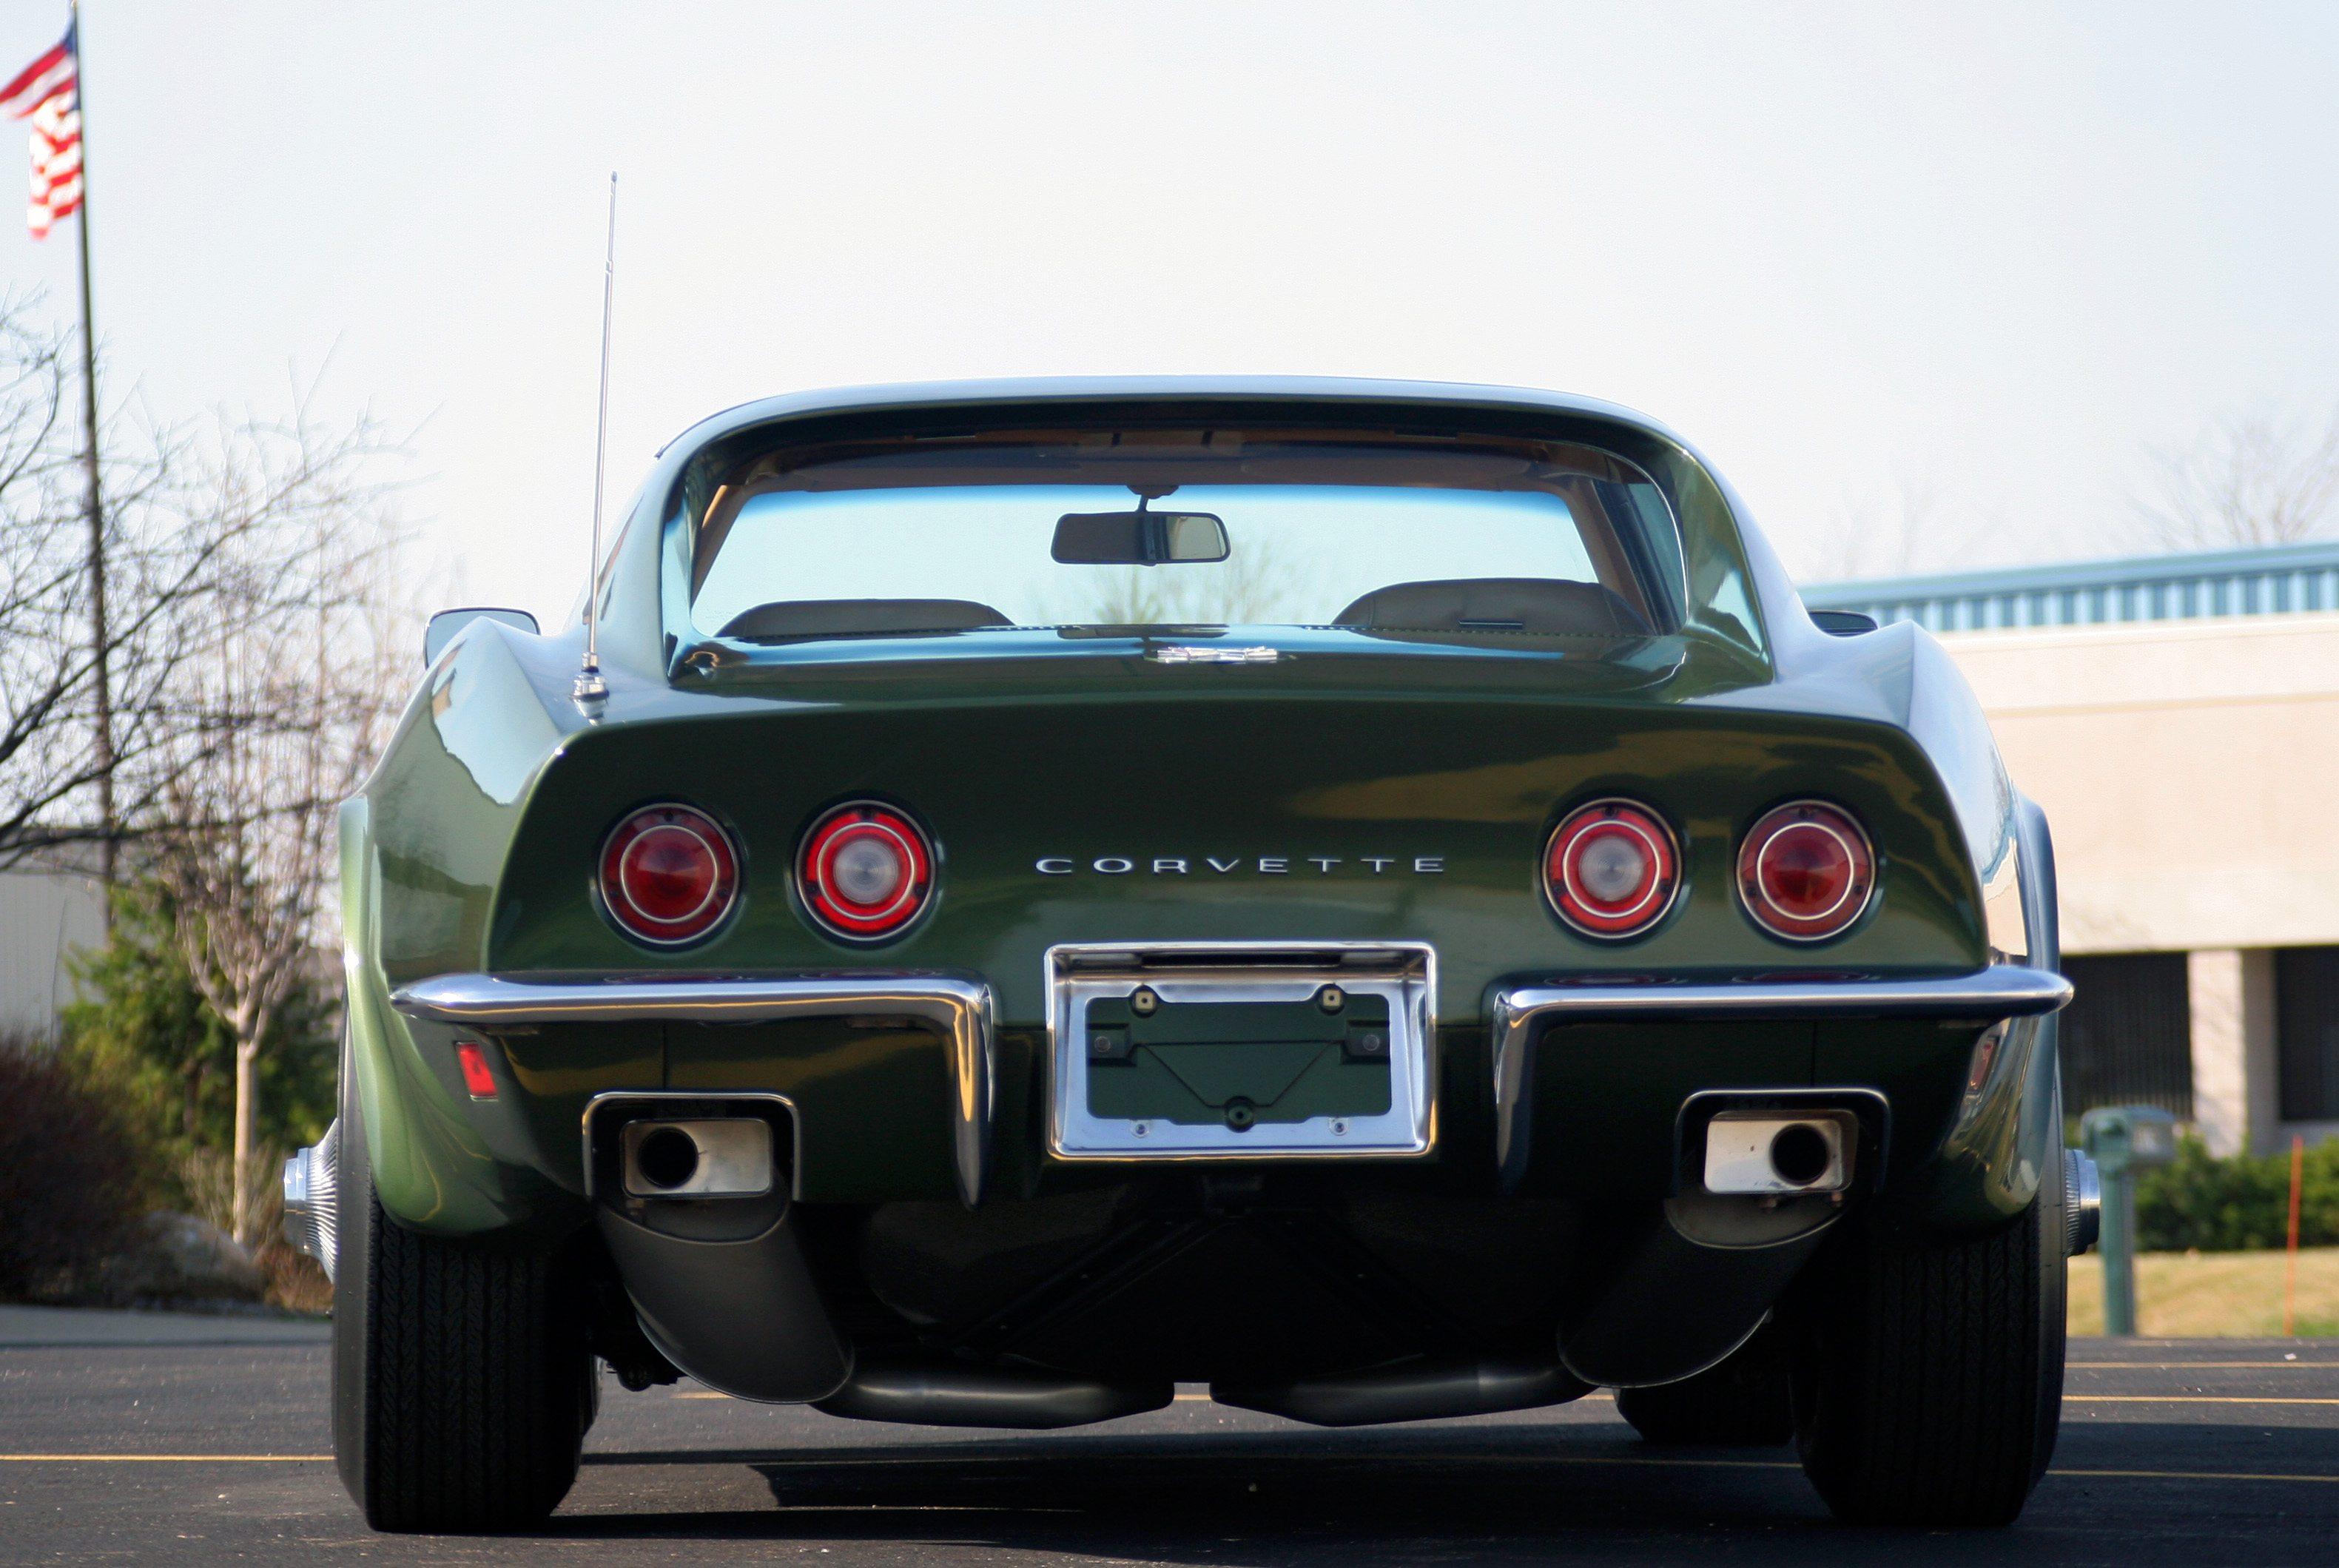 1970 C3 Corvette | Ultimate Guide (Overview, Specs, VIN Info